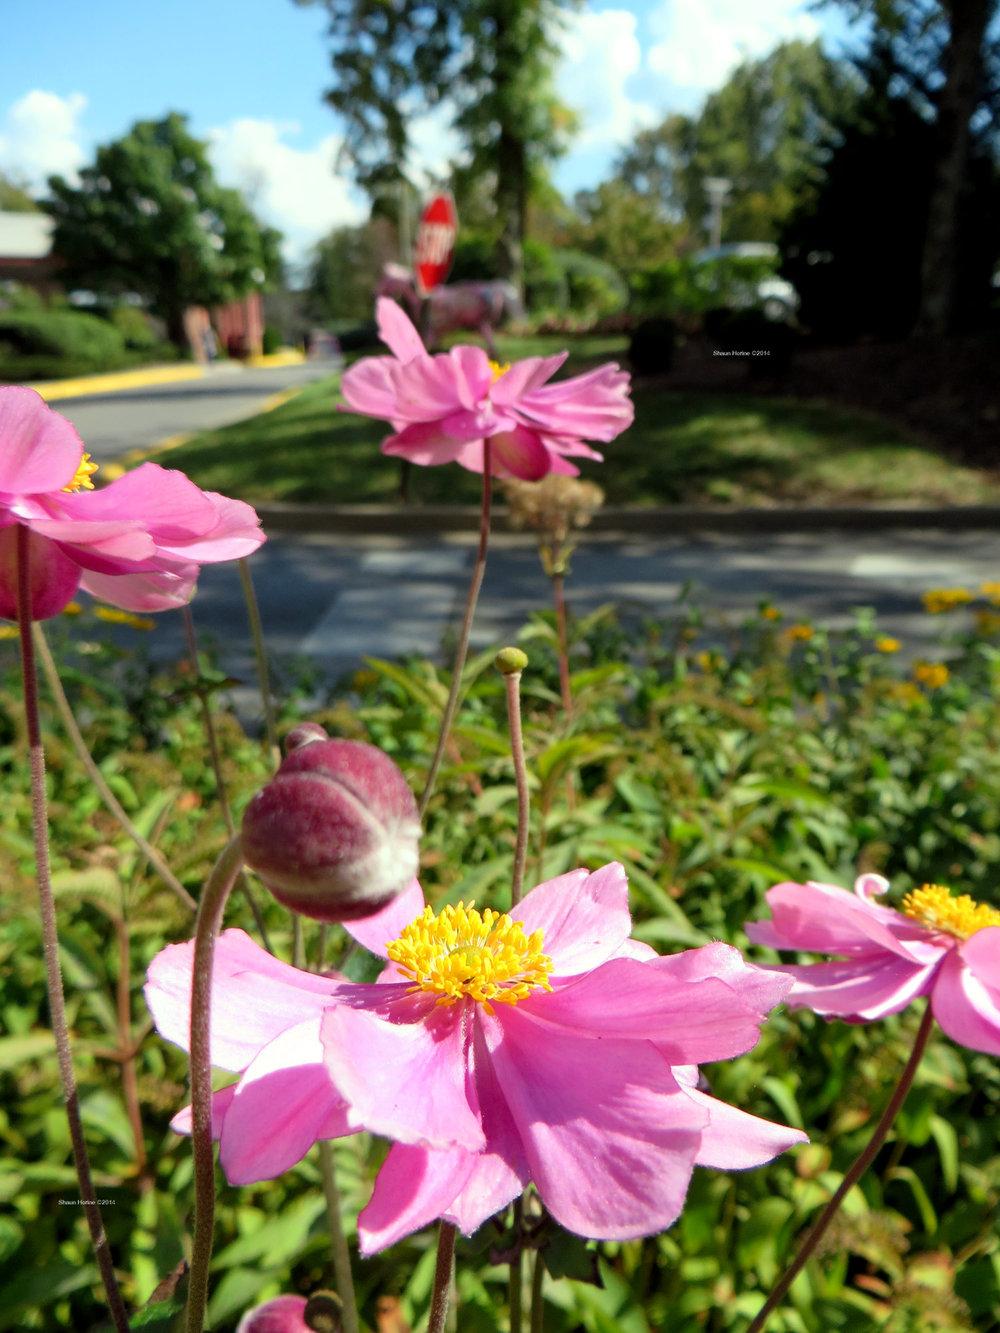 More flowers in the garden waiting area. Baptist Hospital Lexington, KY. Canon SX280 HS